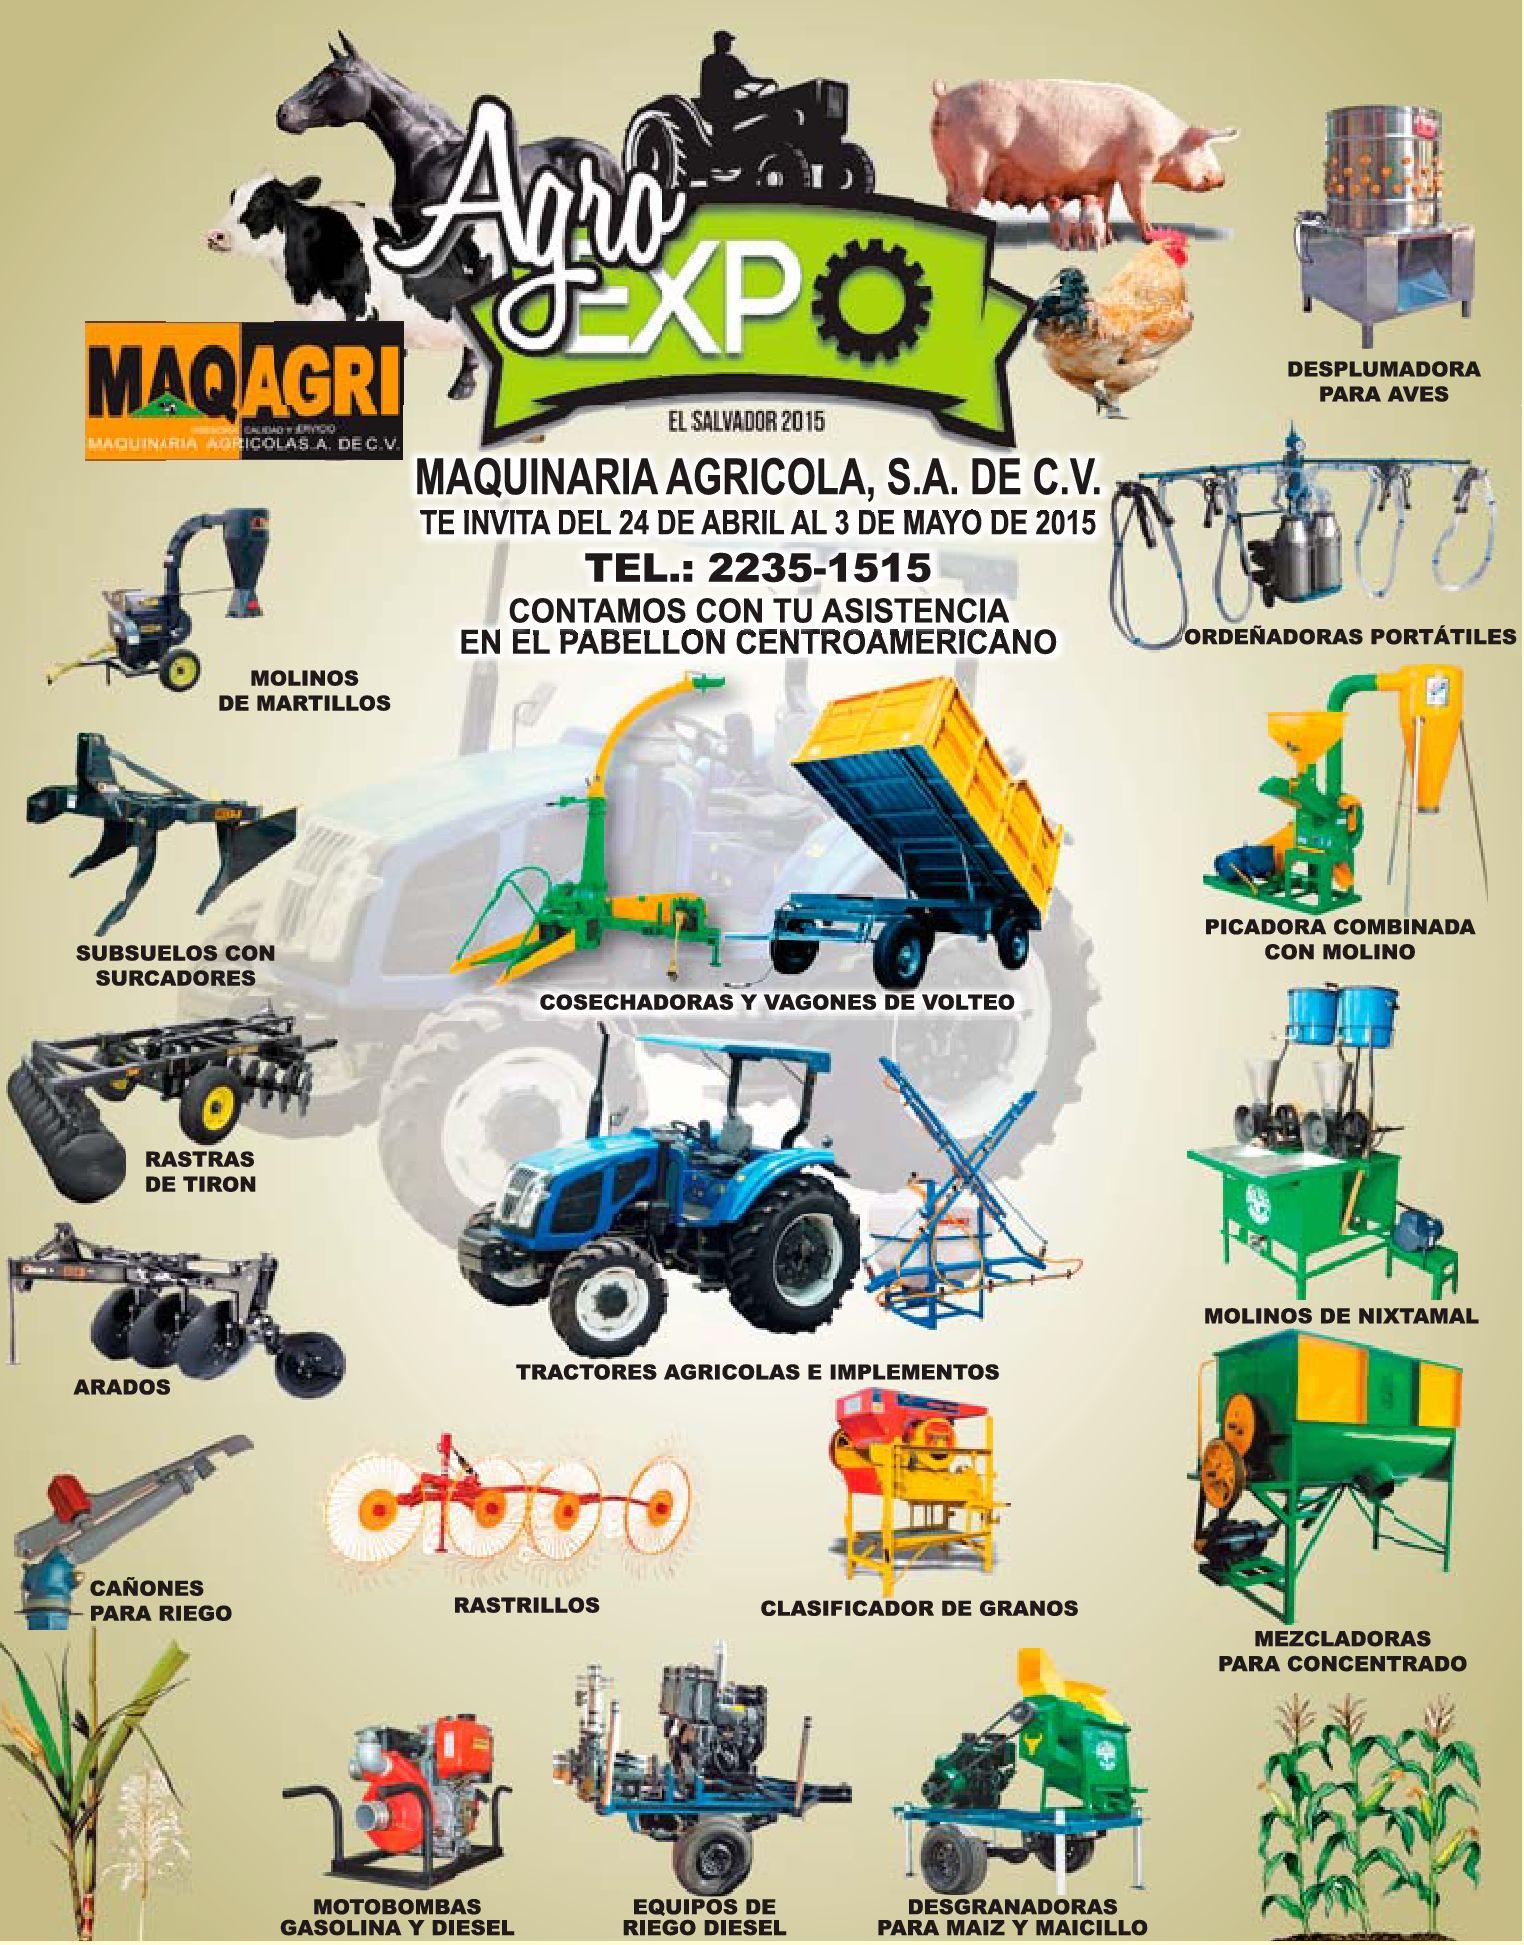 Agro EXPO 2015 maquinaria industrial agricola